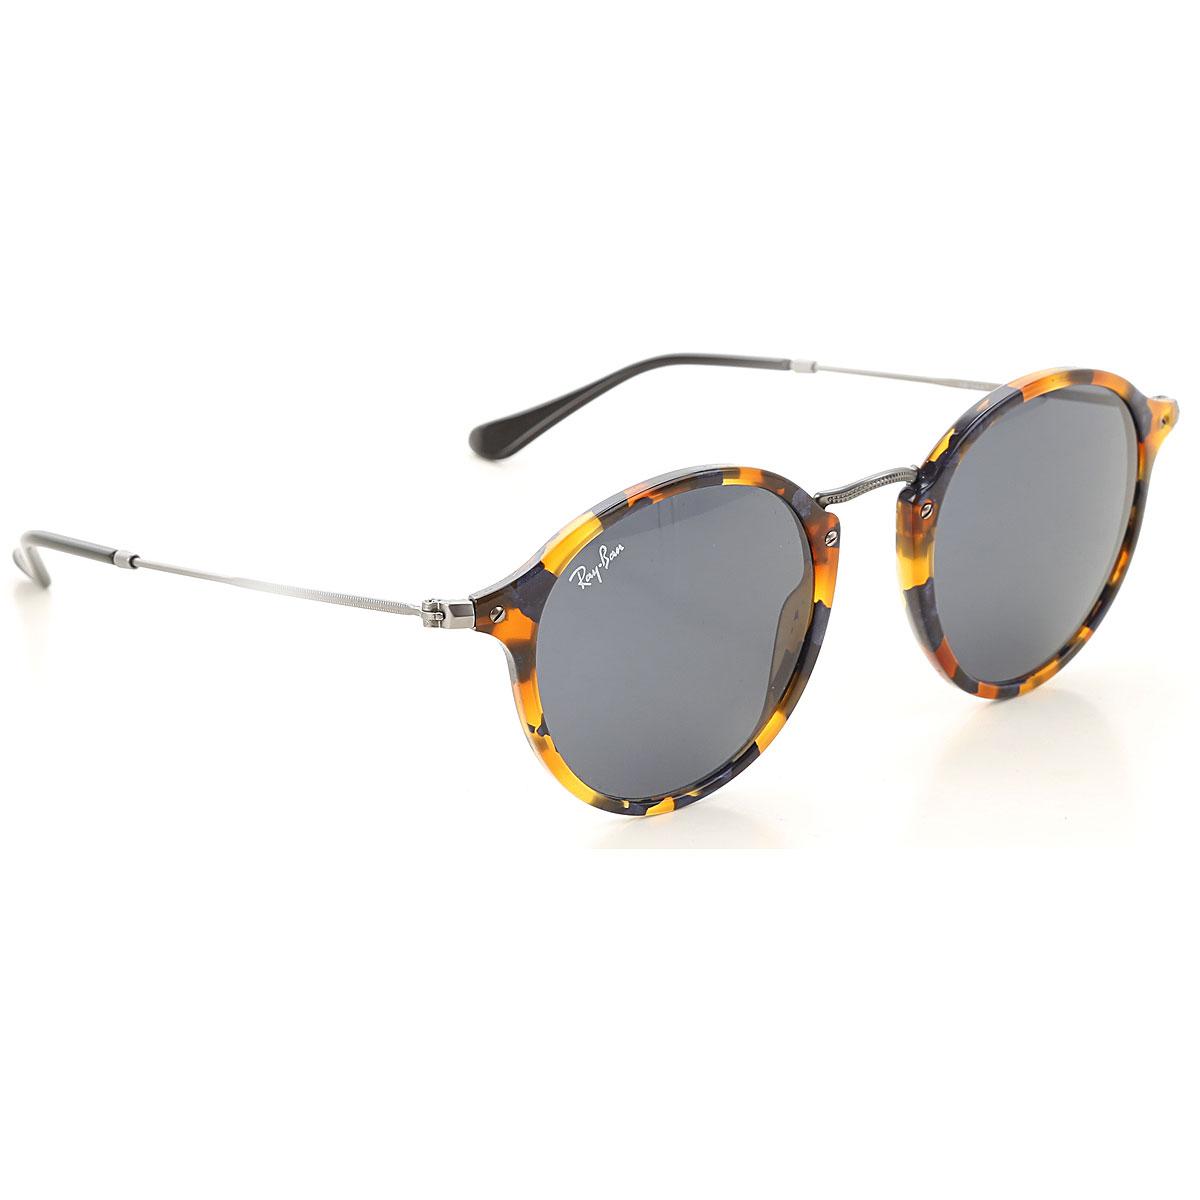 Ray Ban Sunglasses On Sale, Spotted Blue Havana, 2019